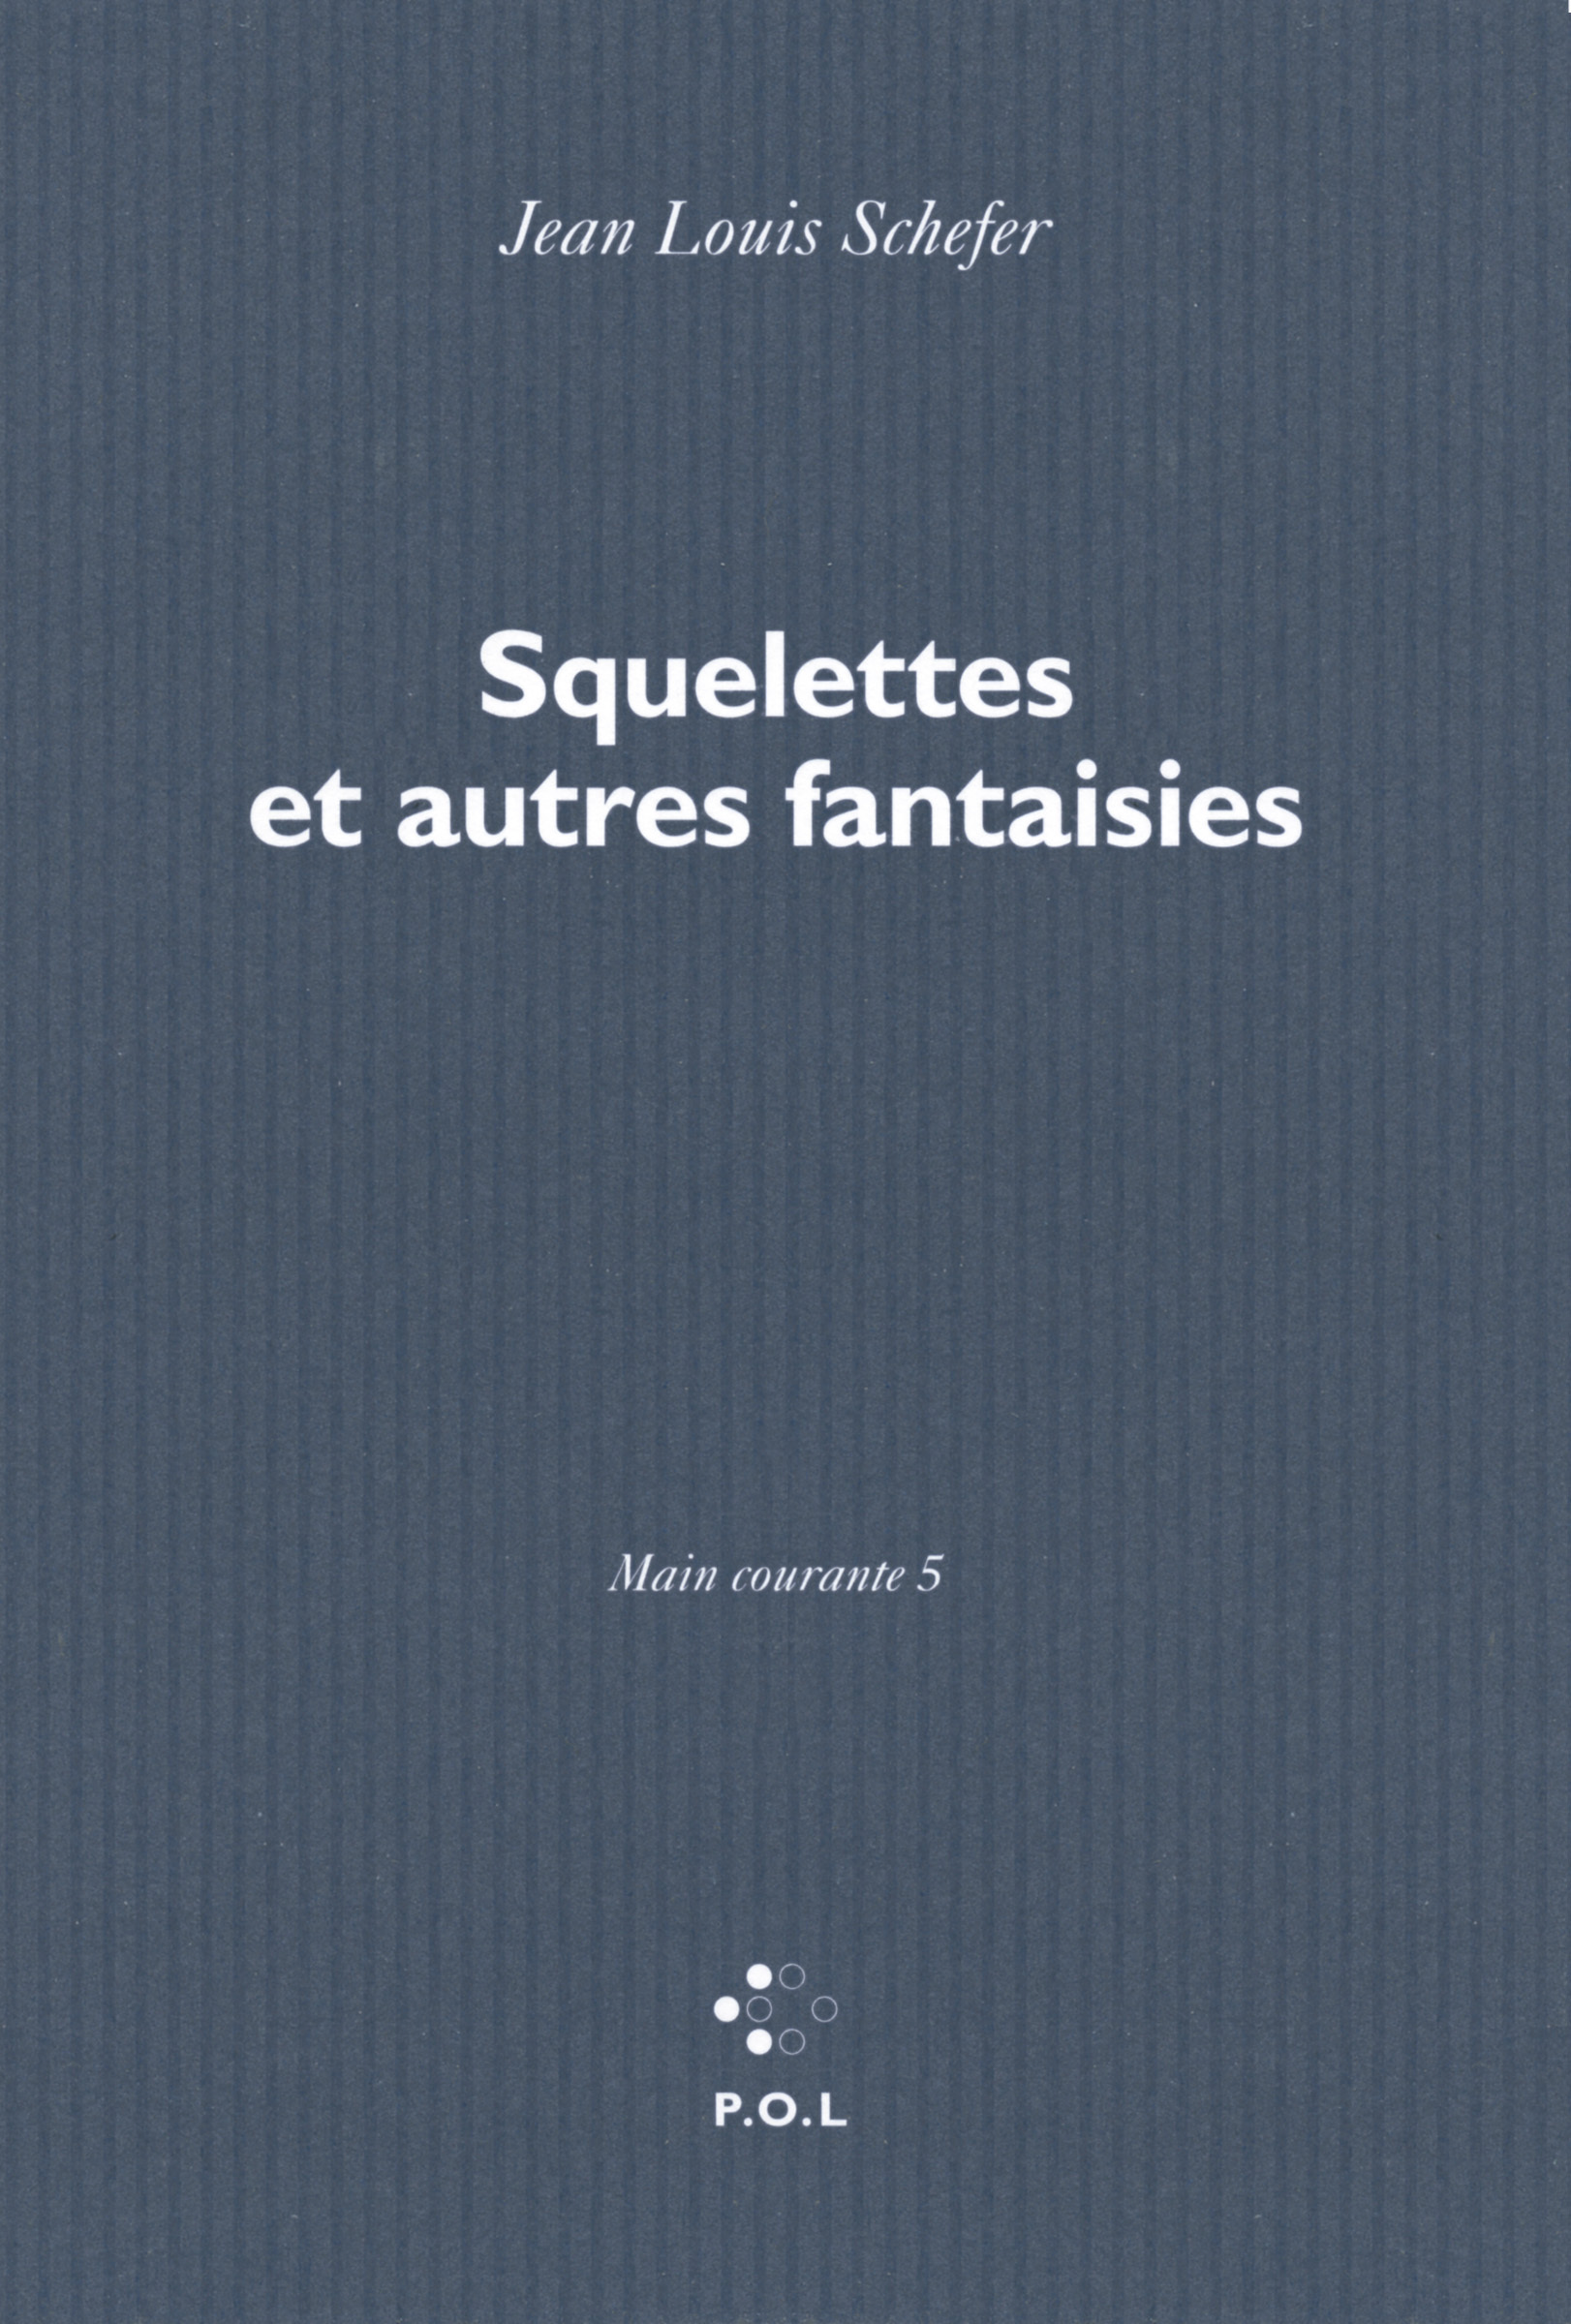 MAIN COURANTE, V : SQUELETTES ET AUTRES FANTAISIES - MAIN COURANTE 5